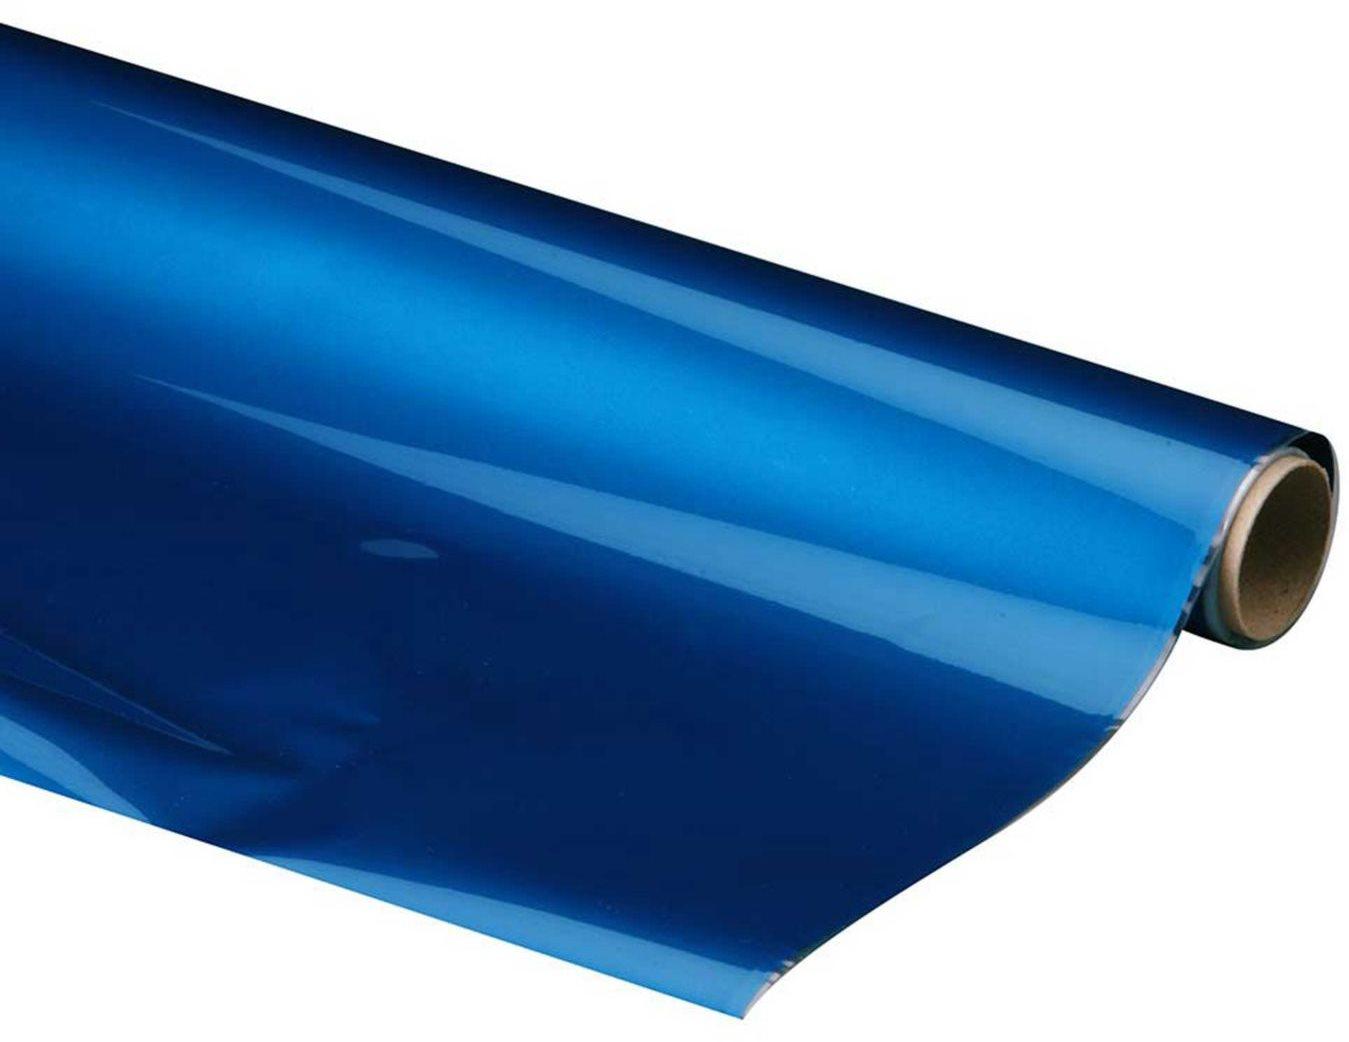 Top Flite MonoKote Metallic Blue 6\'